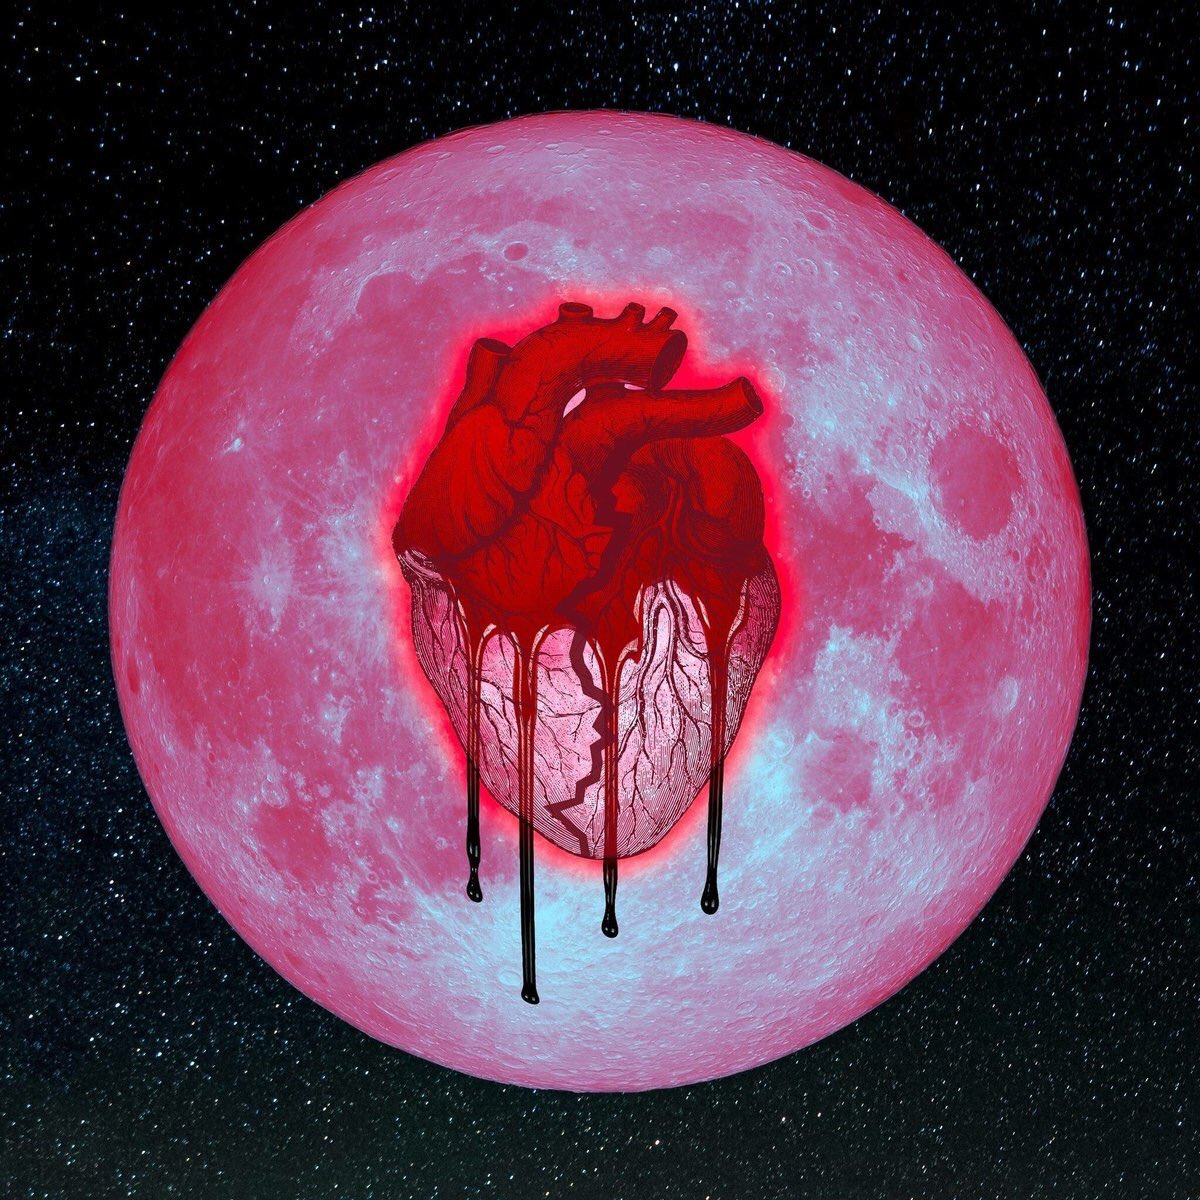 Stream #HeartbreakOnAFullMoon on @Spotify now! 💔🌕 https://t.co/DSgT1oHFQG https://t.co/vZzXFastM2